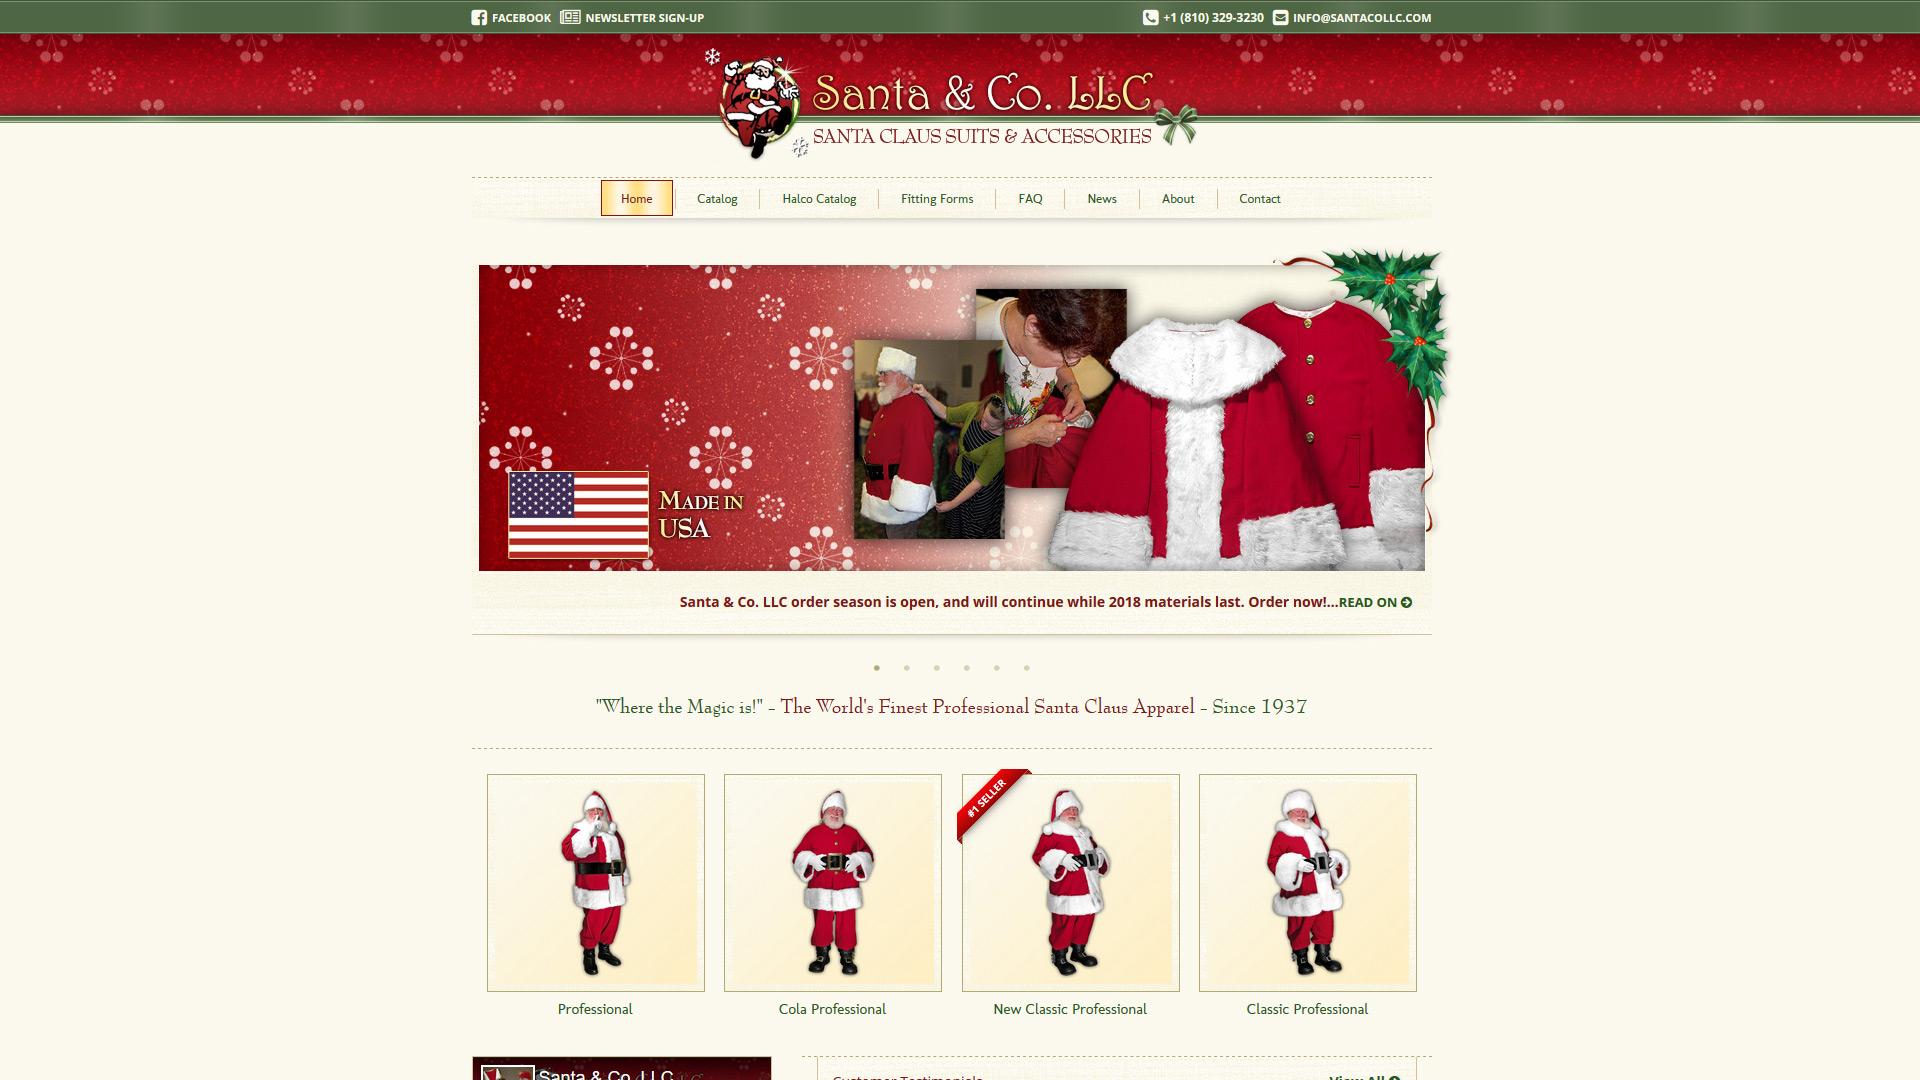 Santa & Co. LLC | http://santacollc.com